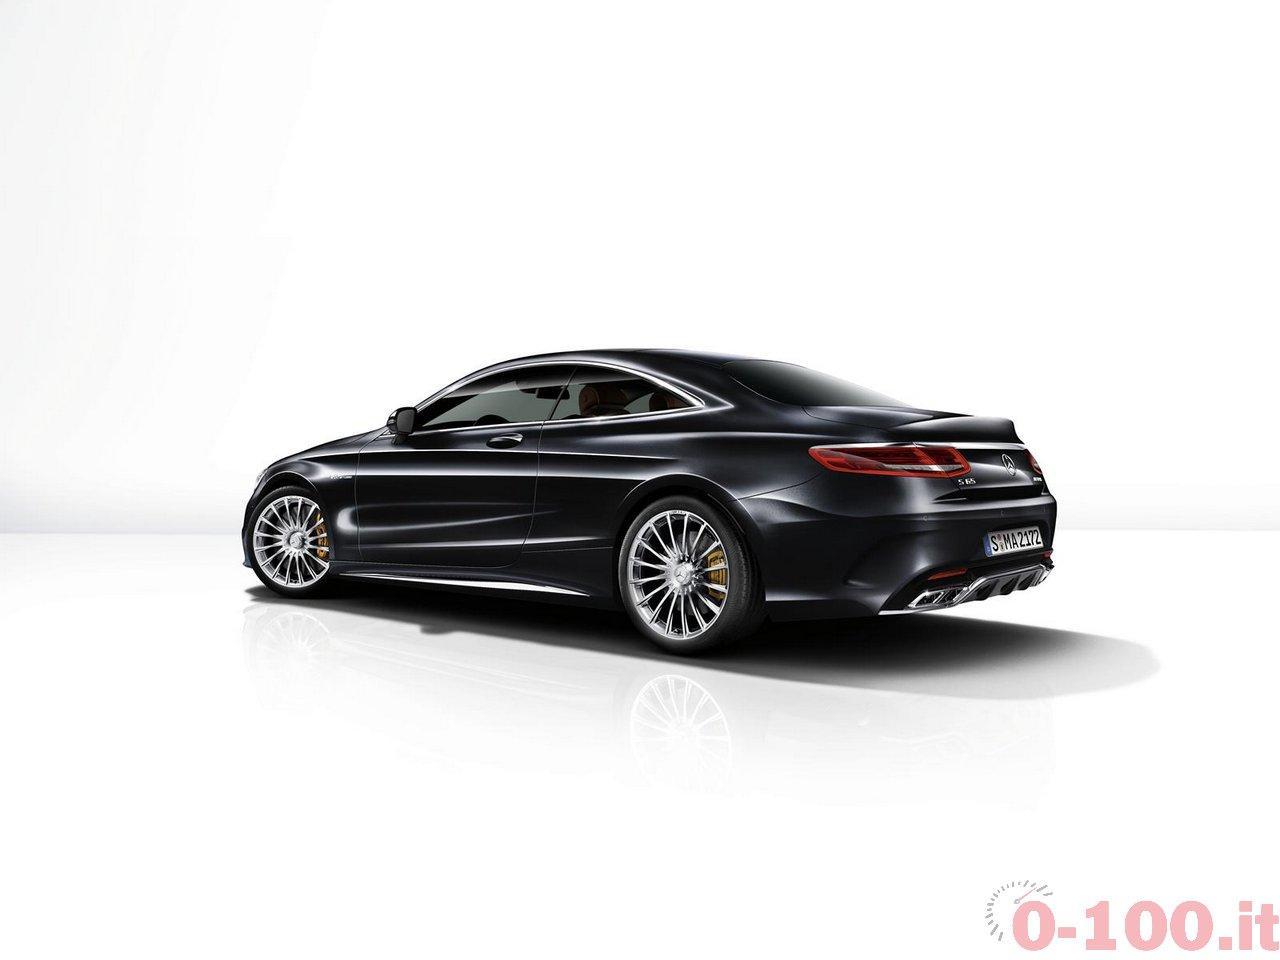 mercedes-s65-amg-coupe-630-cavalli-e-300-orari-0-100_16